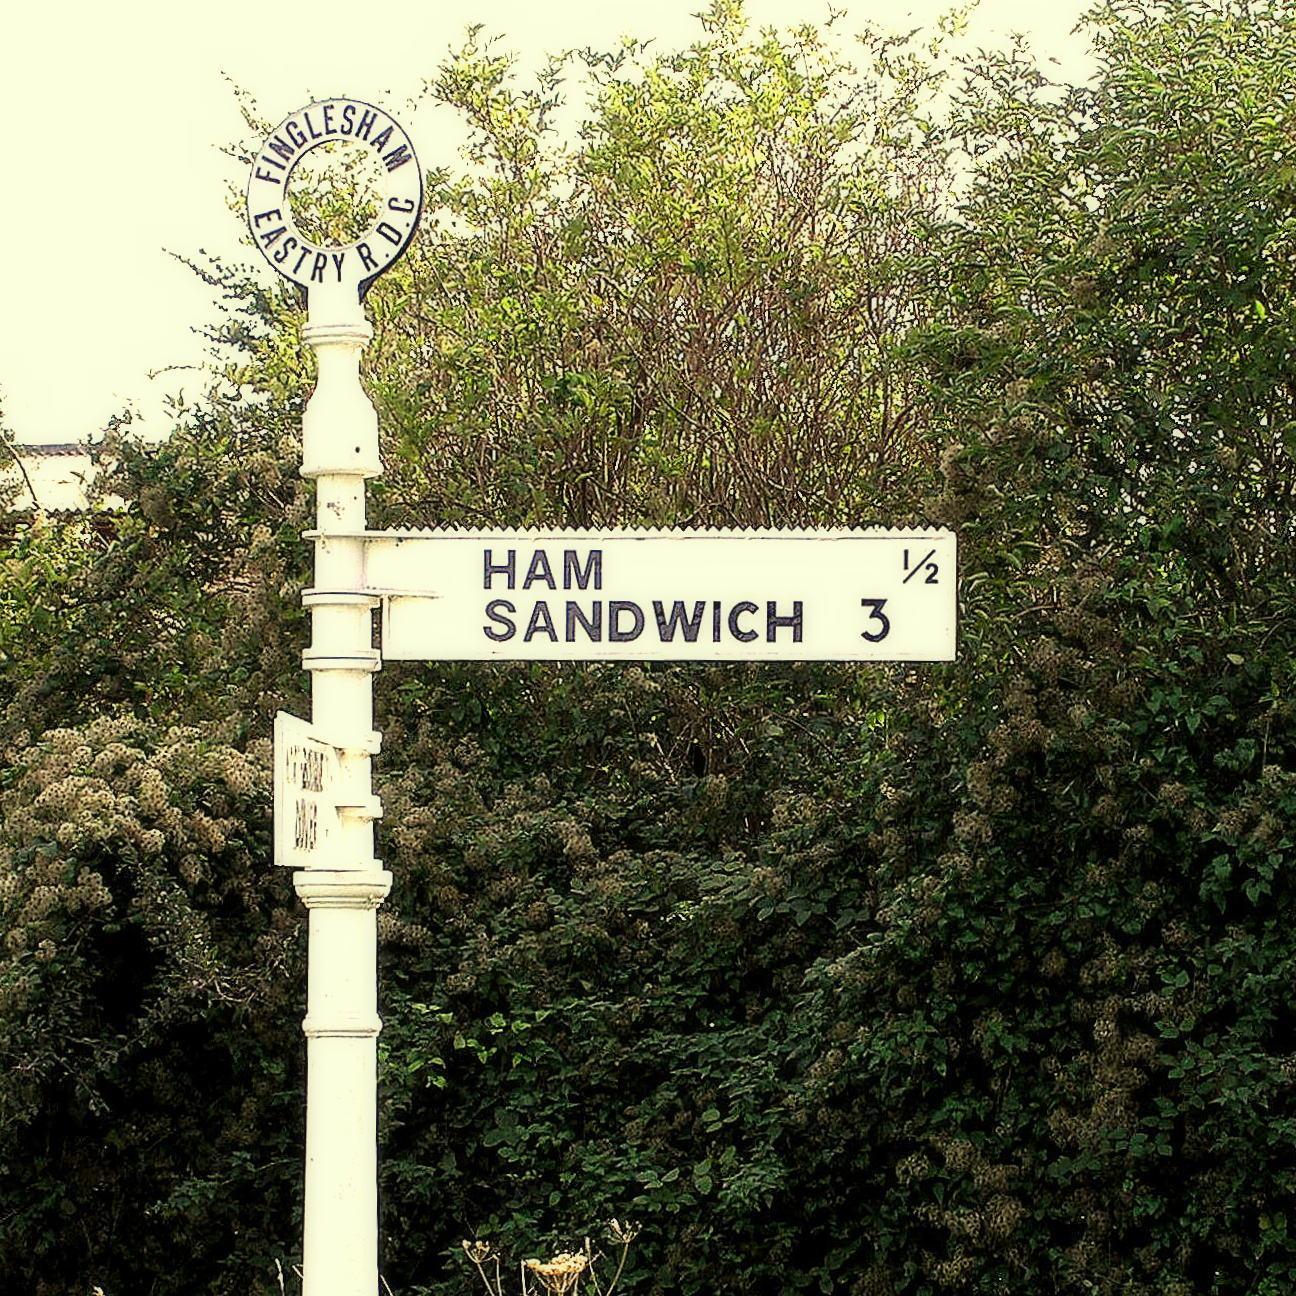 Ham, Sandwich